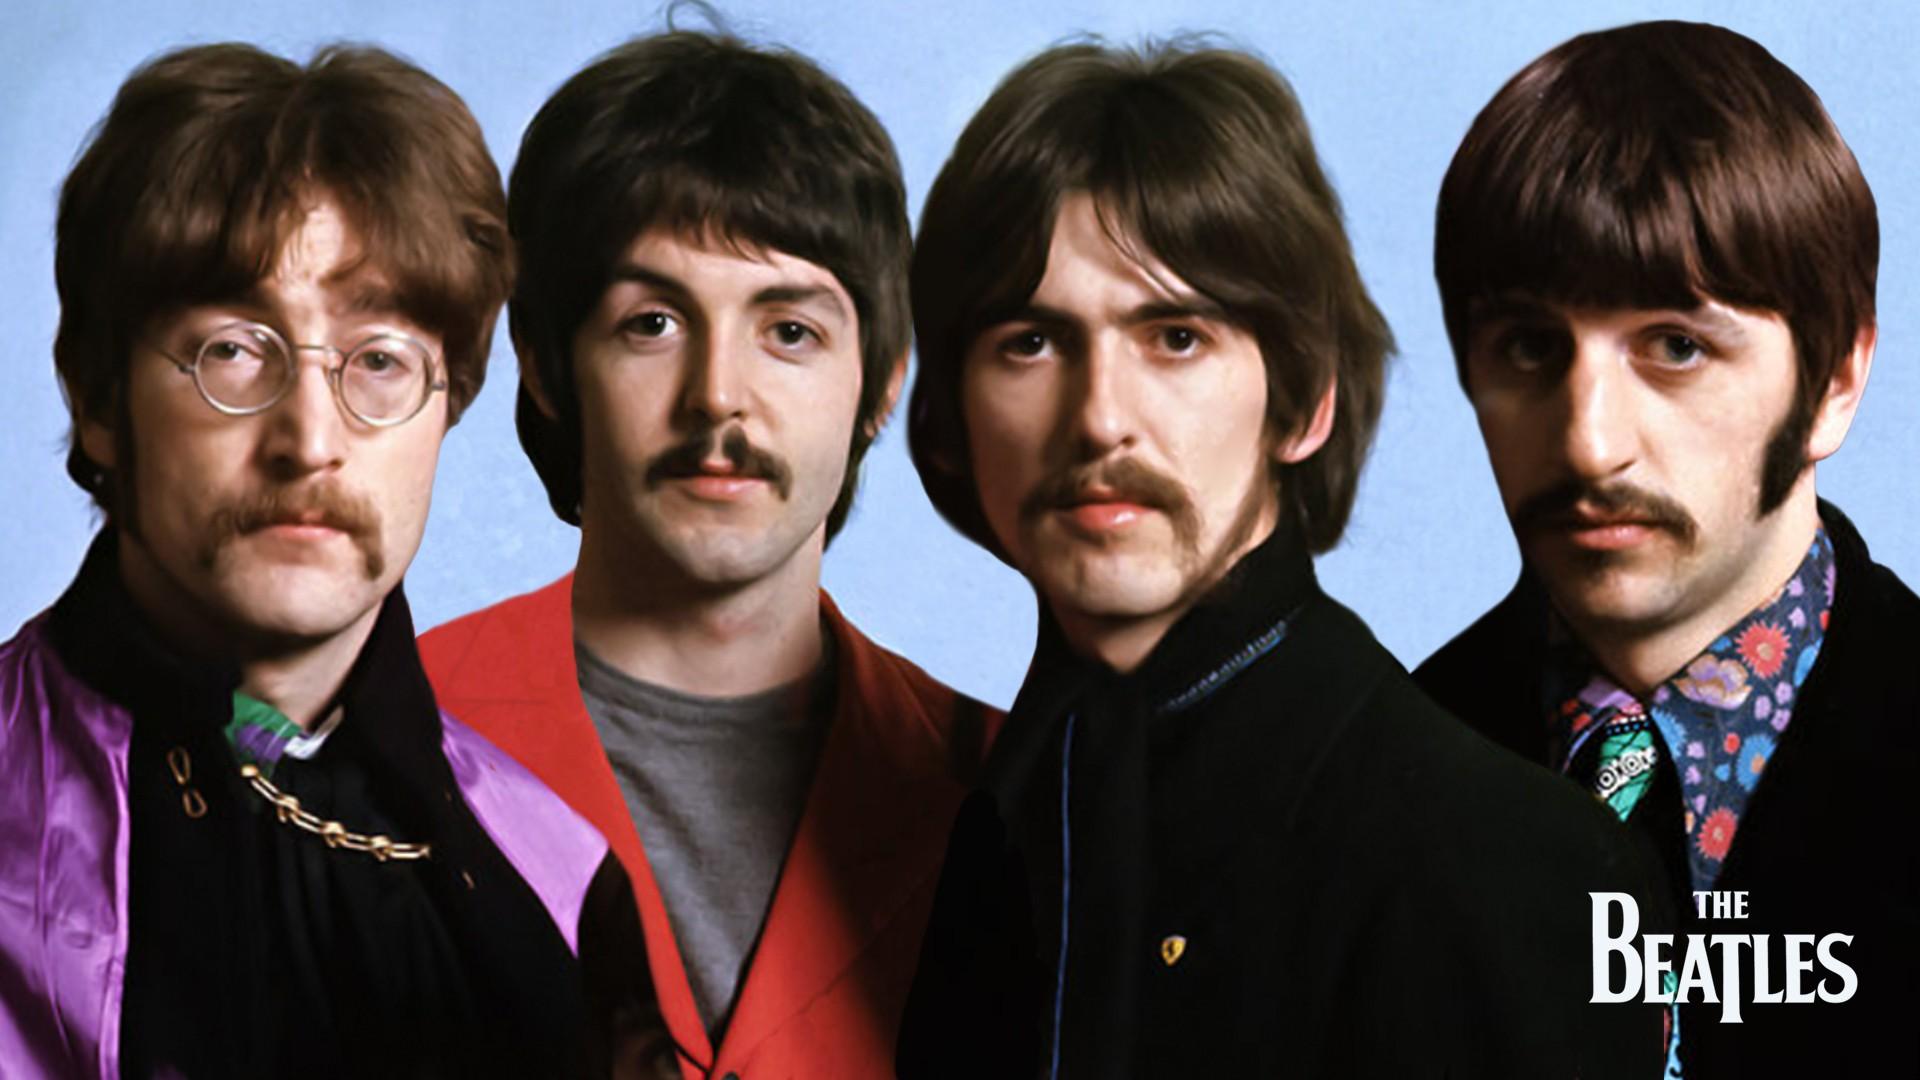 Скончался 1-ый менеджер The Beatles